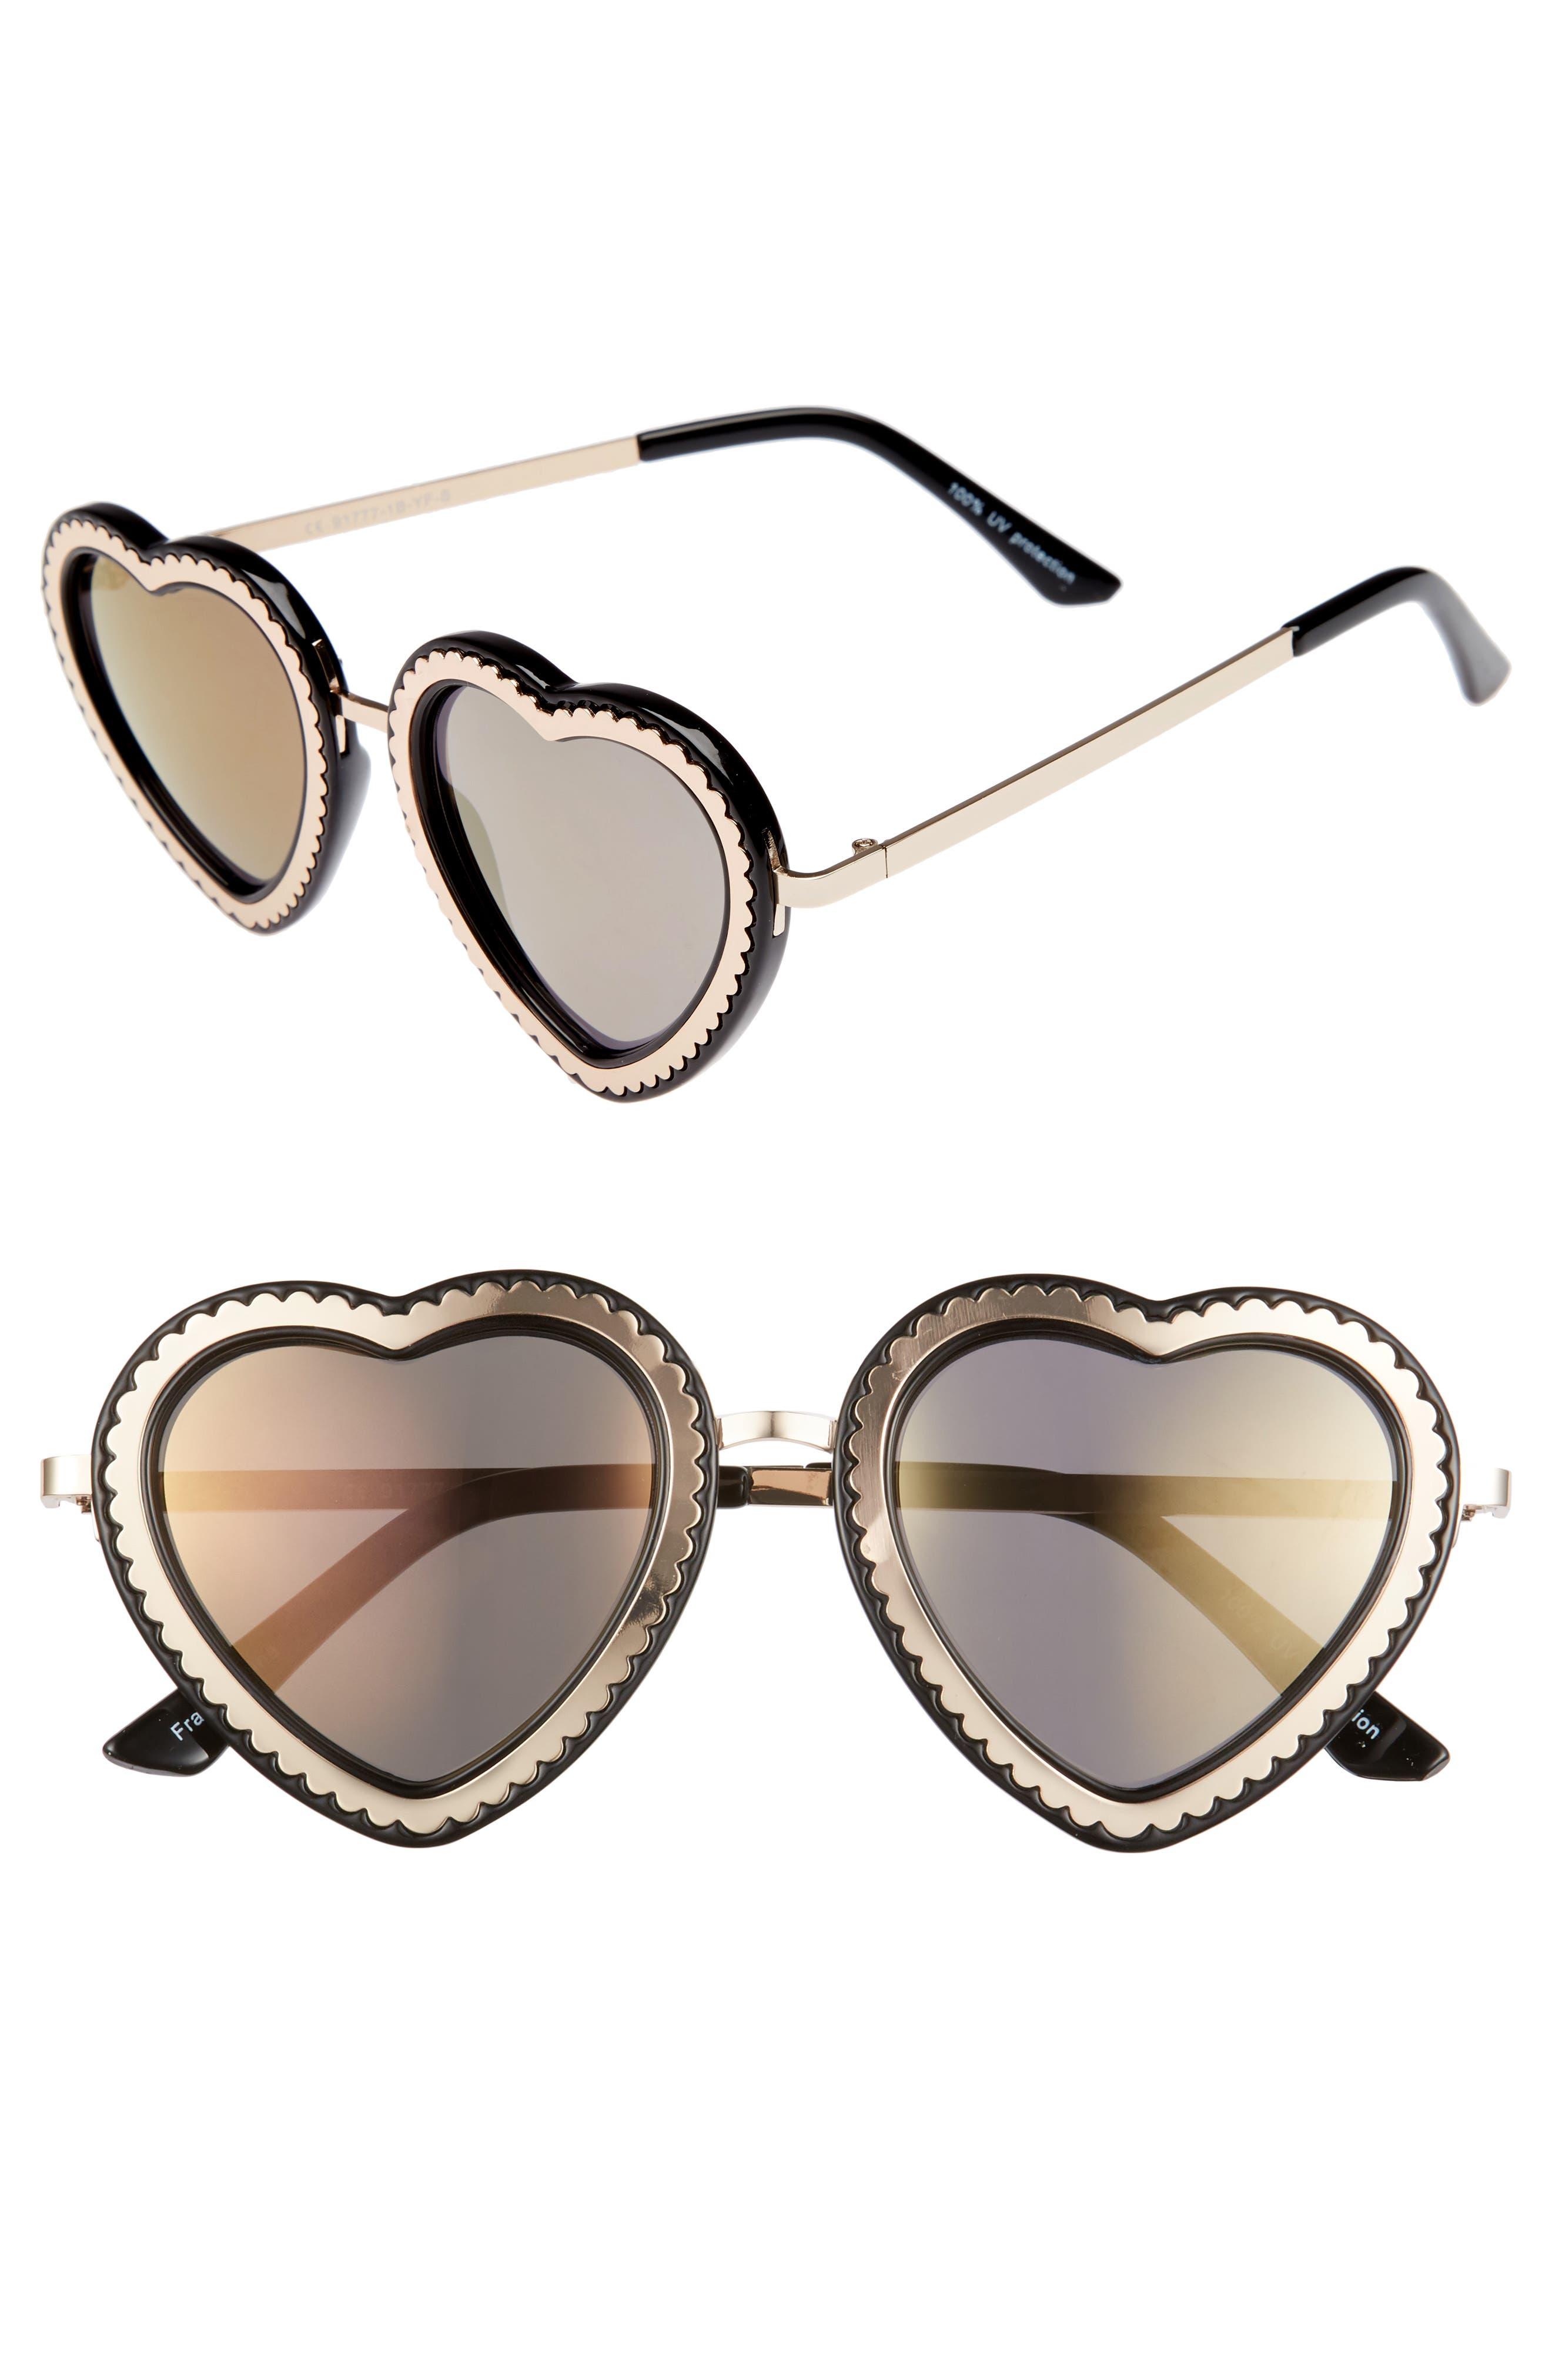 61mm Mirrored Heart Sunglasses,                             Main thumbnail 1, color,                             Gold/ Black